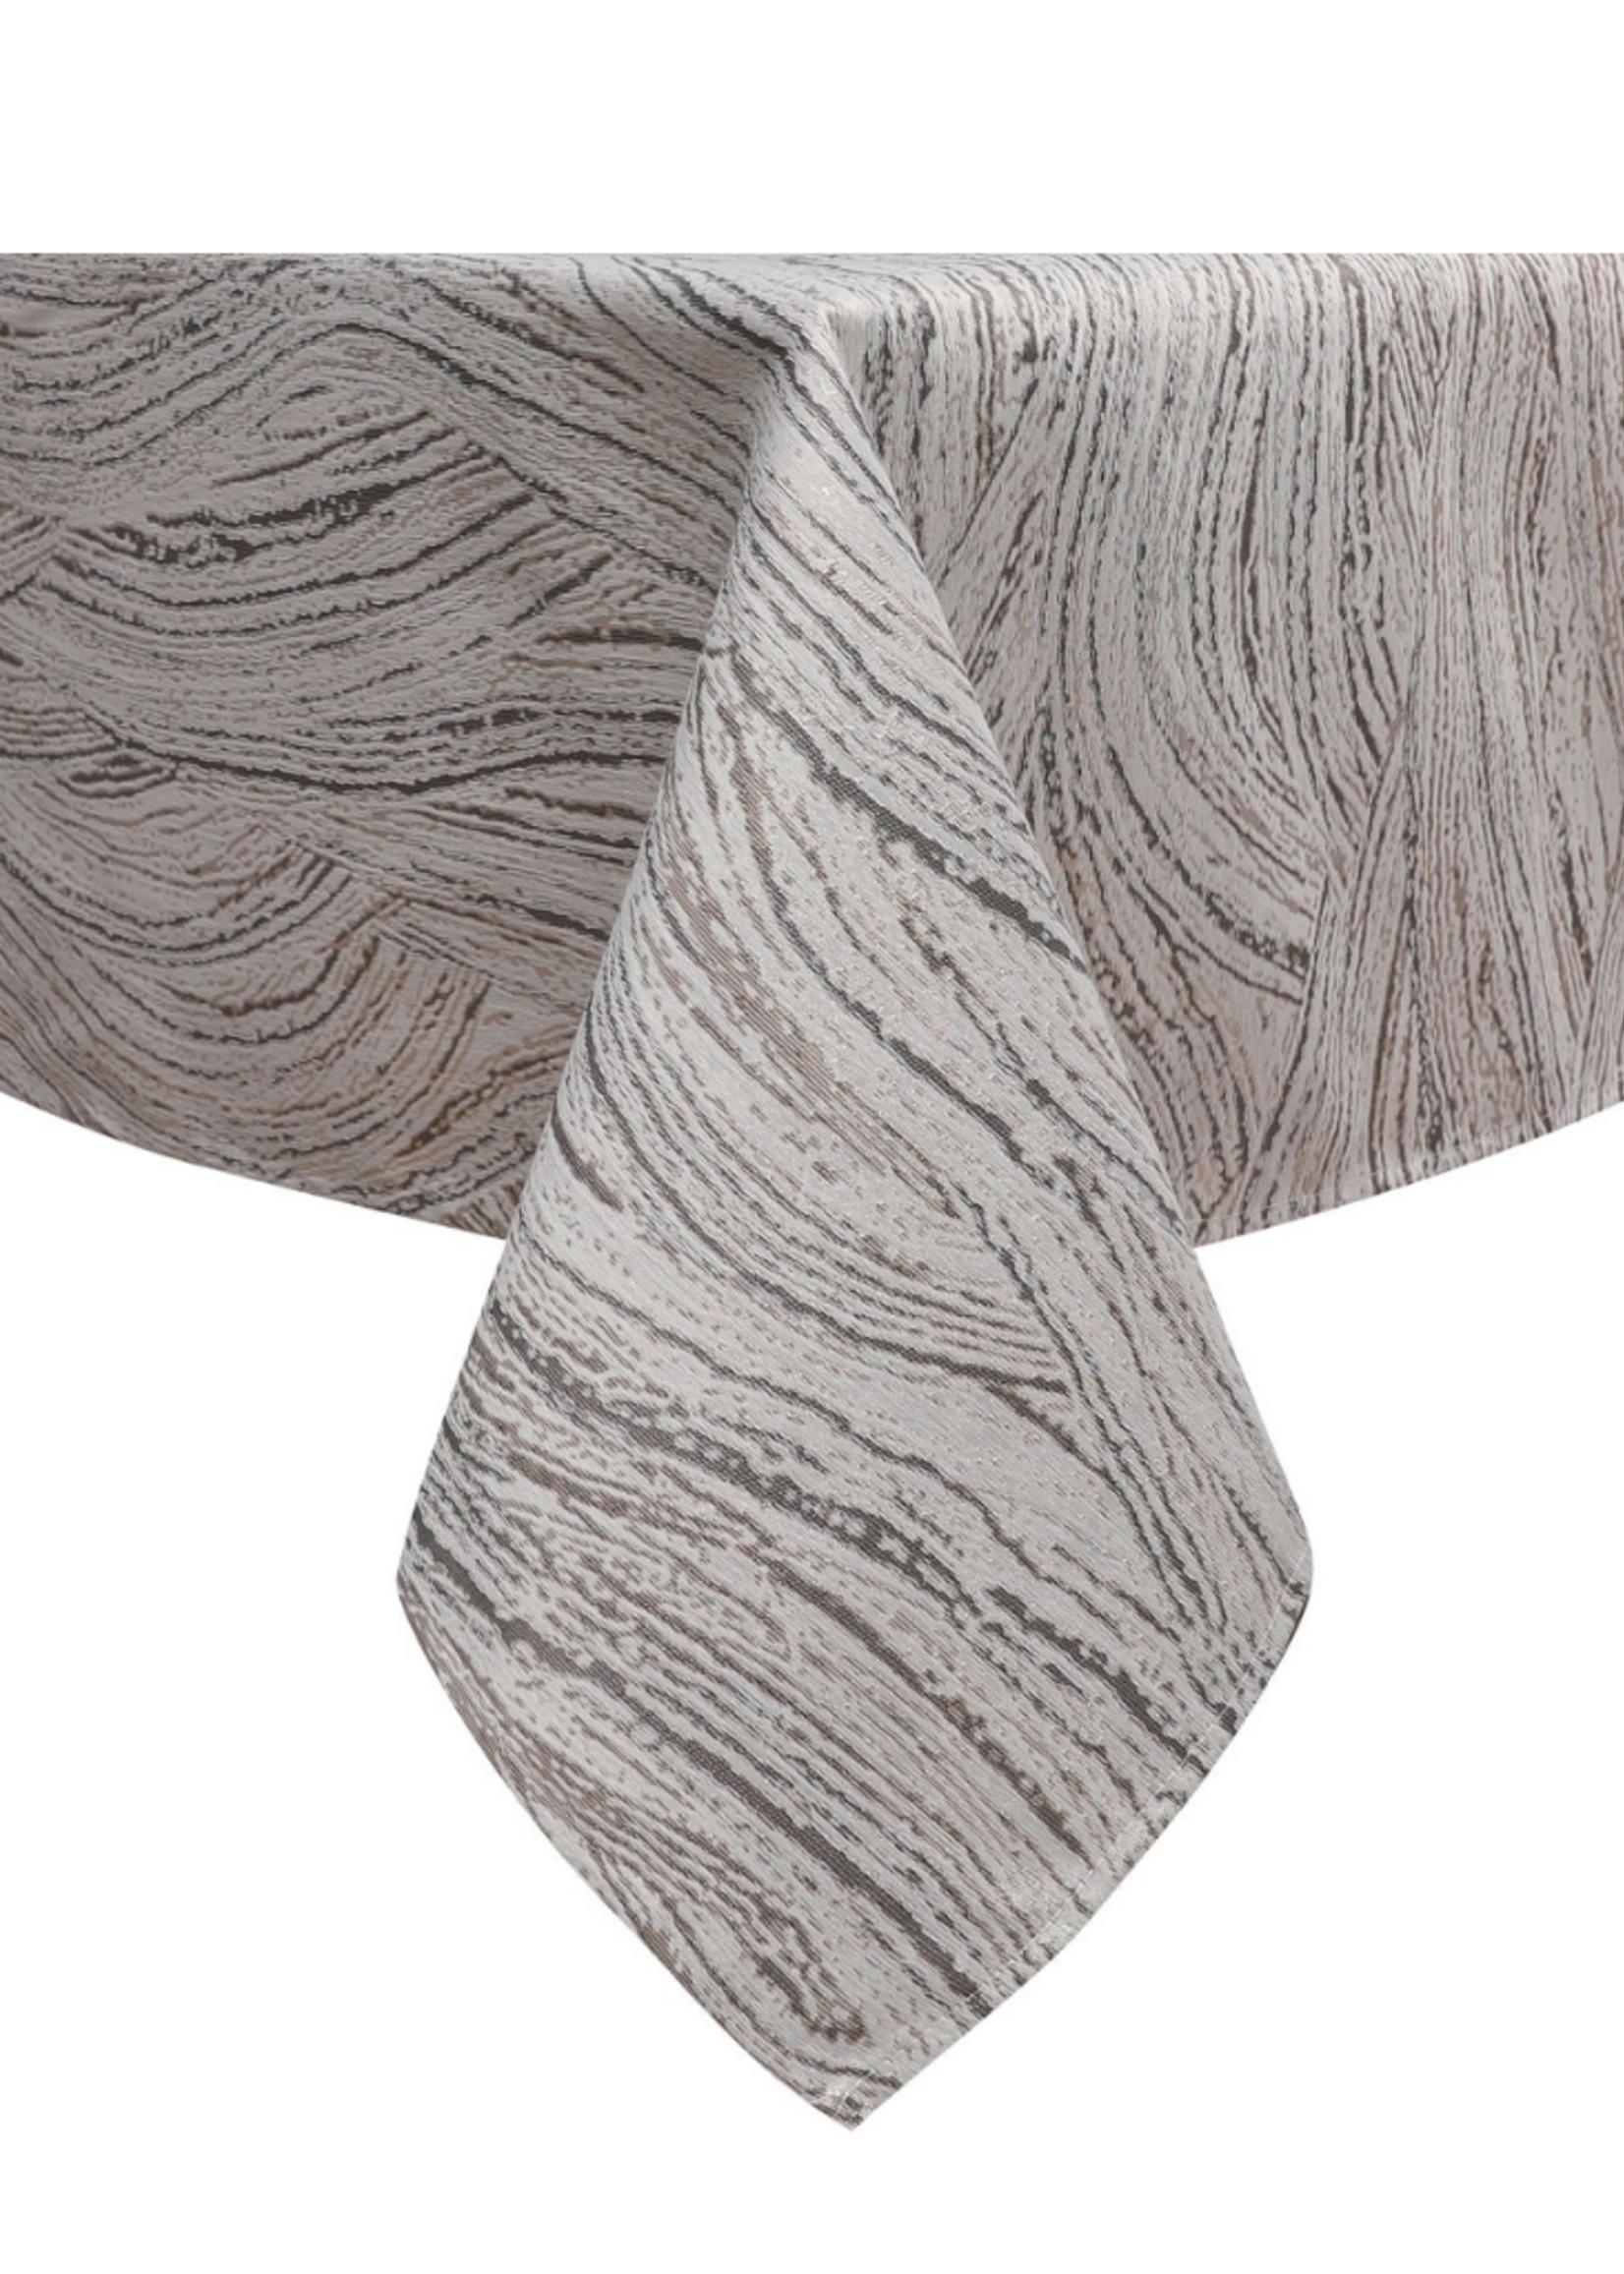 Jacquard Tablecloth Beige/Bronze #1213